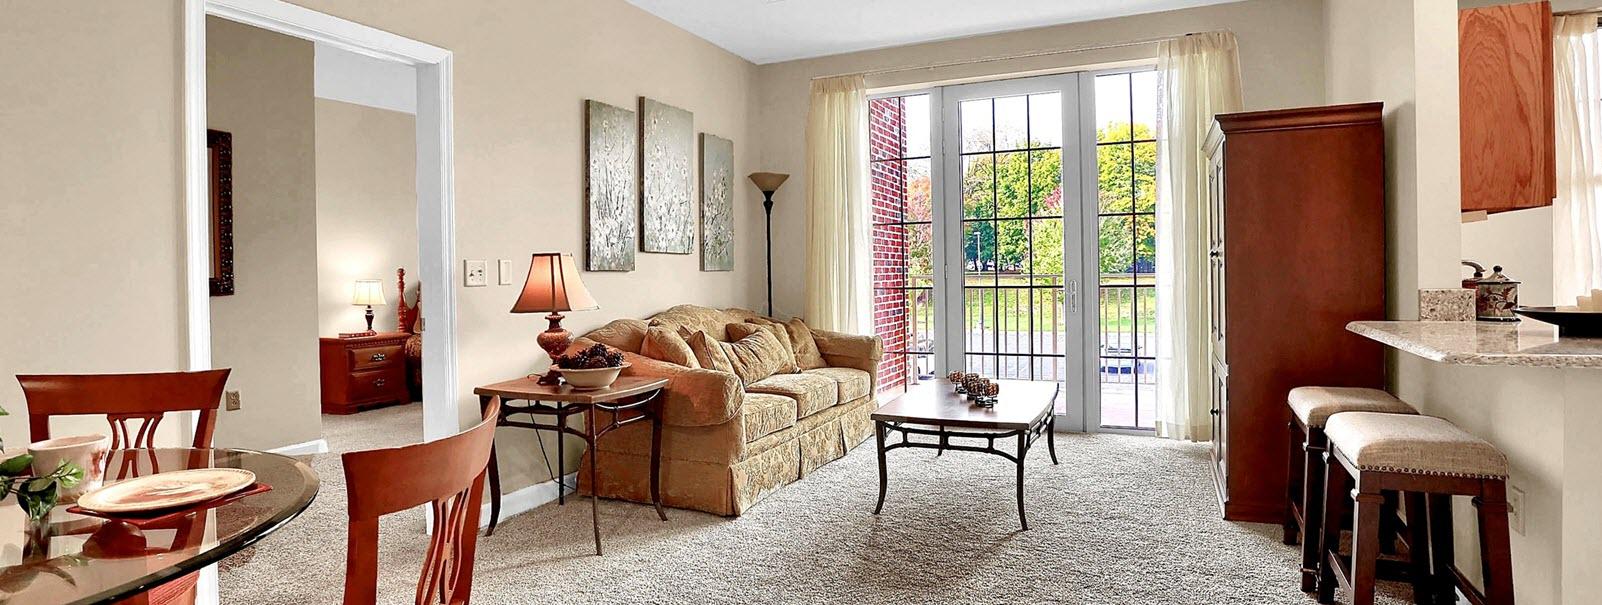 living room area at Asbury Bethany Village senior apartments